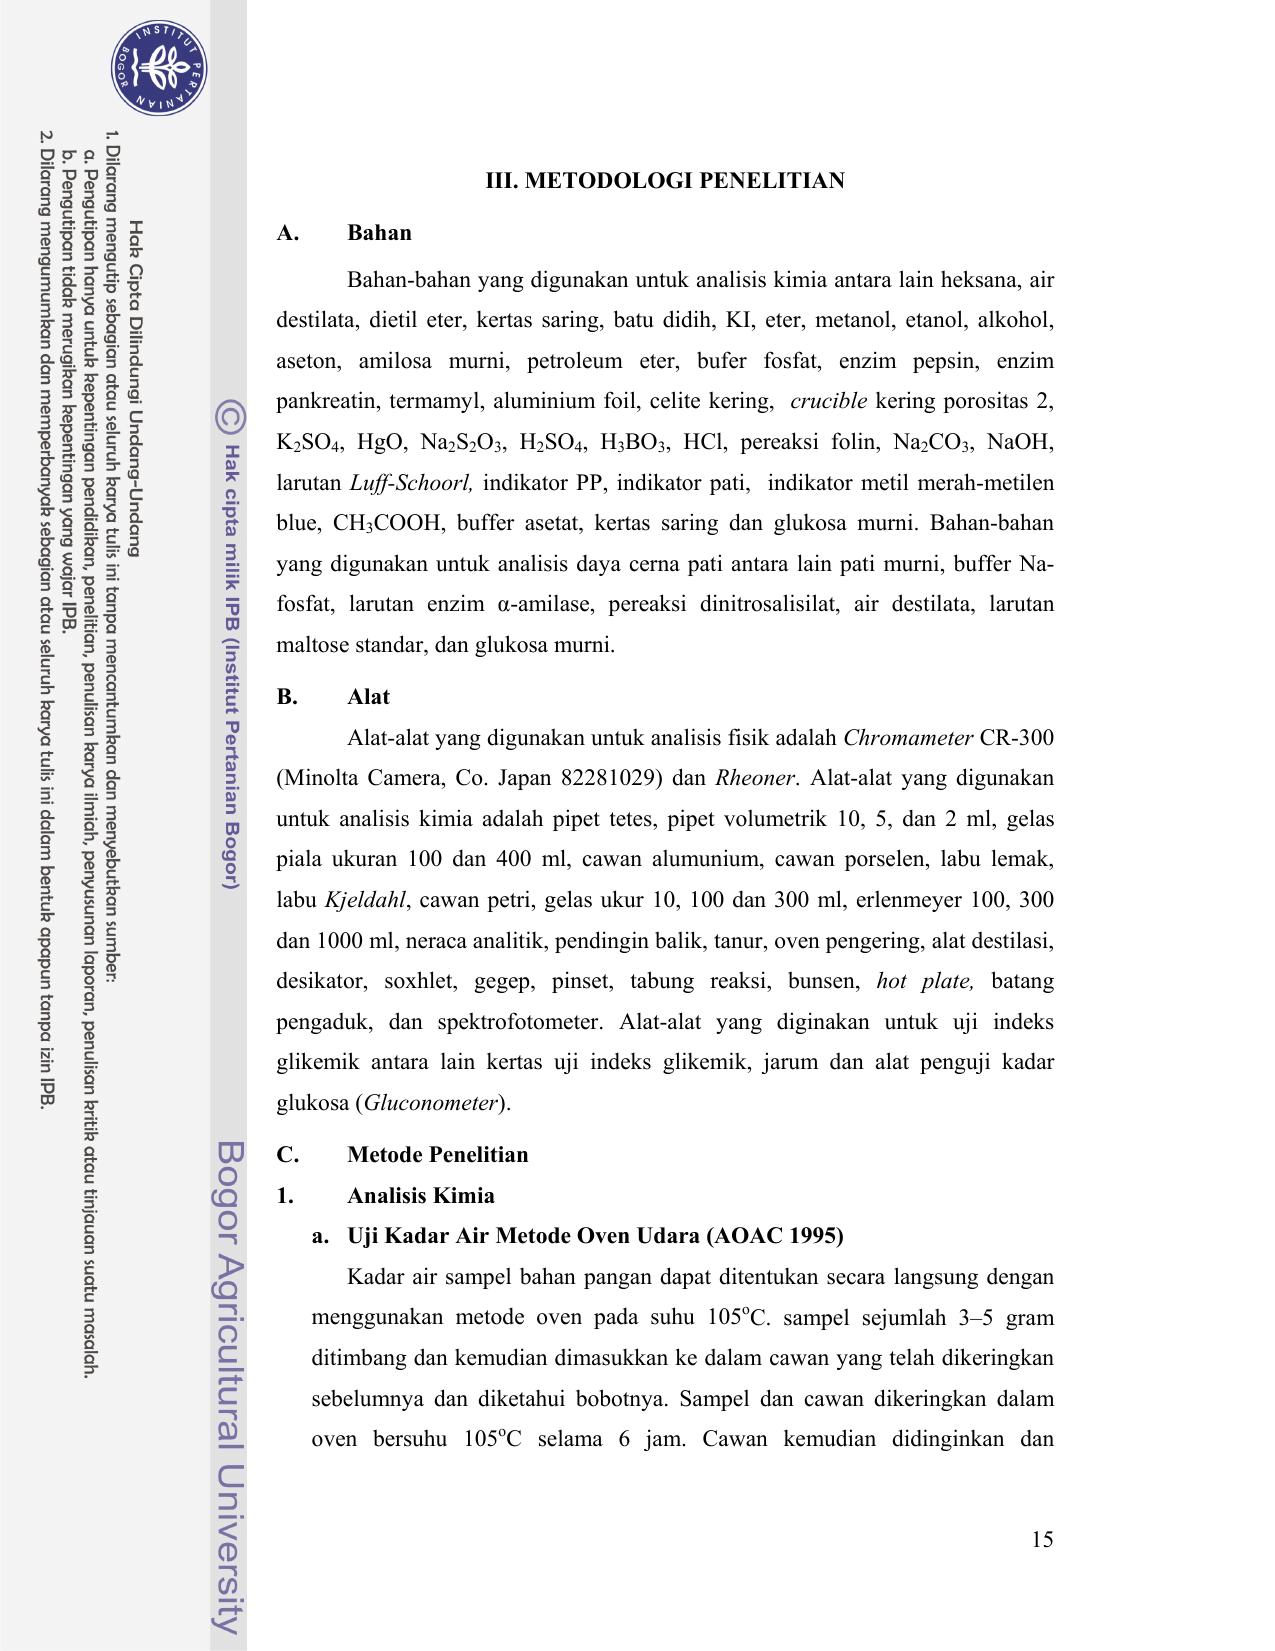 Sifat Fisikokimia Dan Indeks Glikemik Berbagai